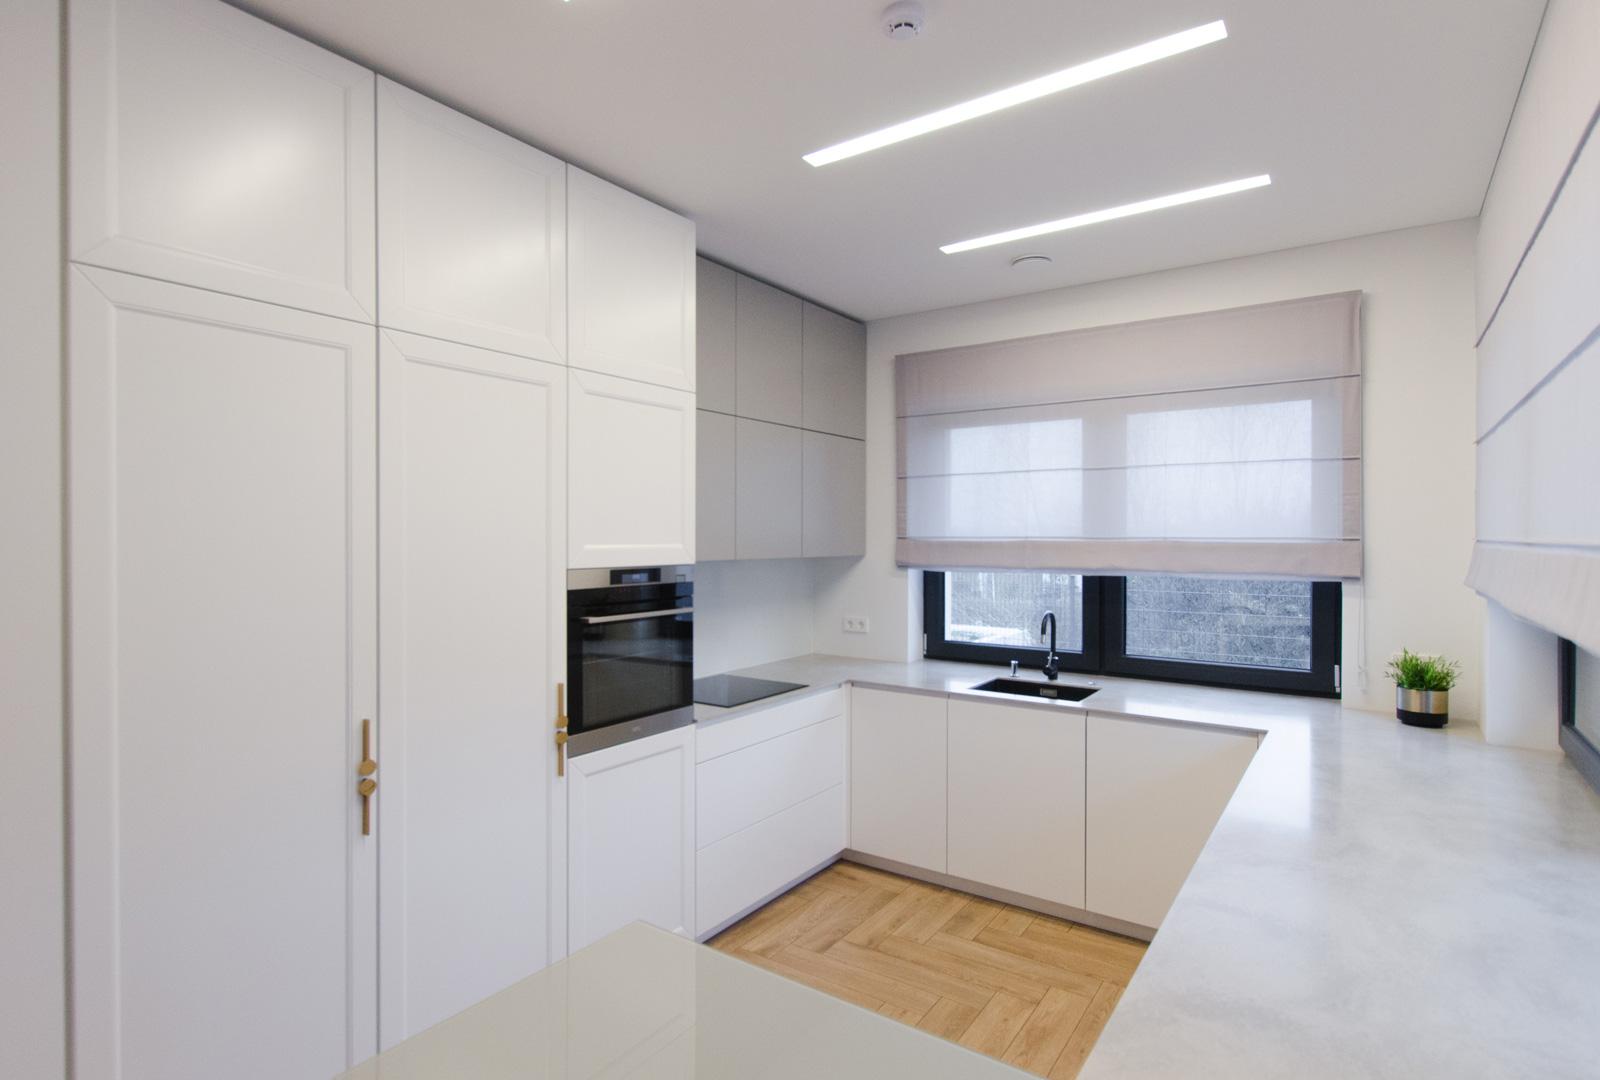 virtuves_baldai_vilnius